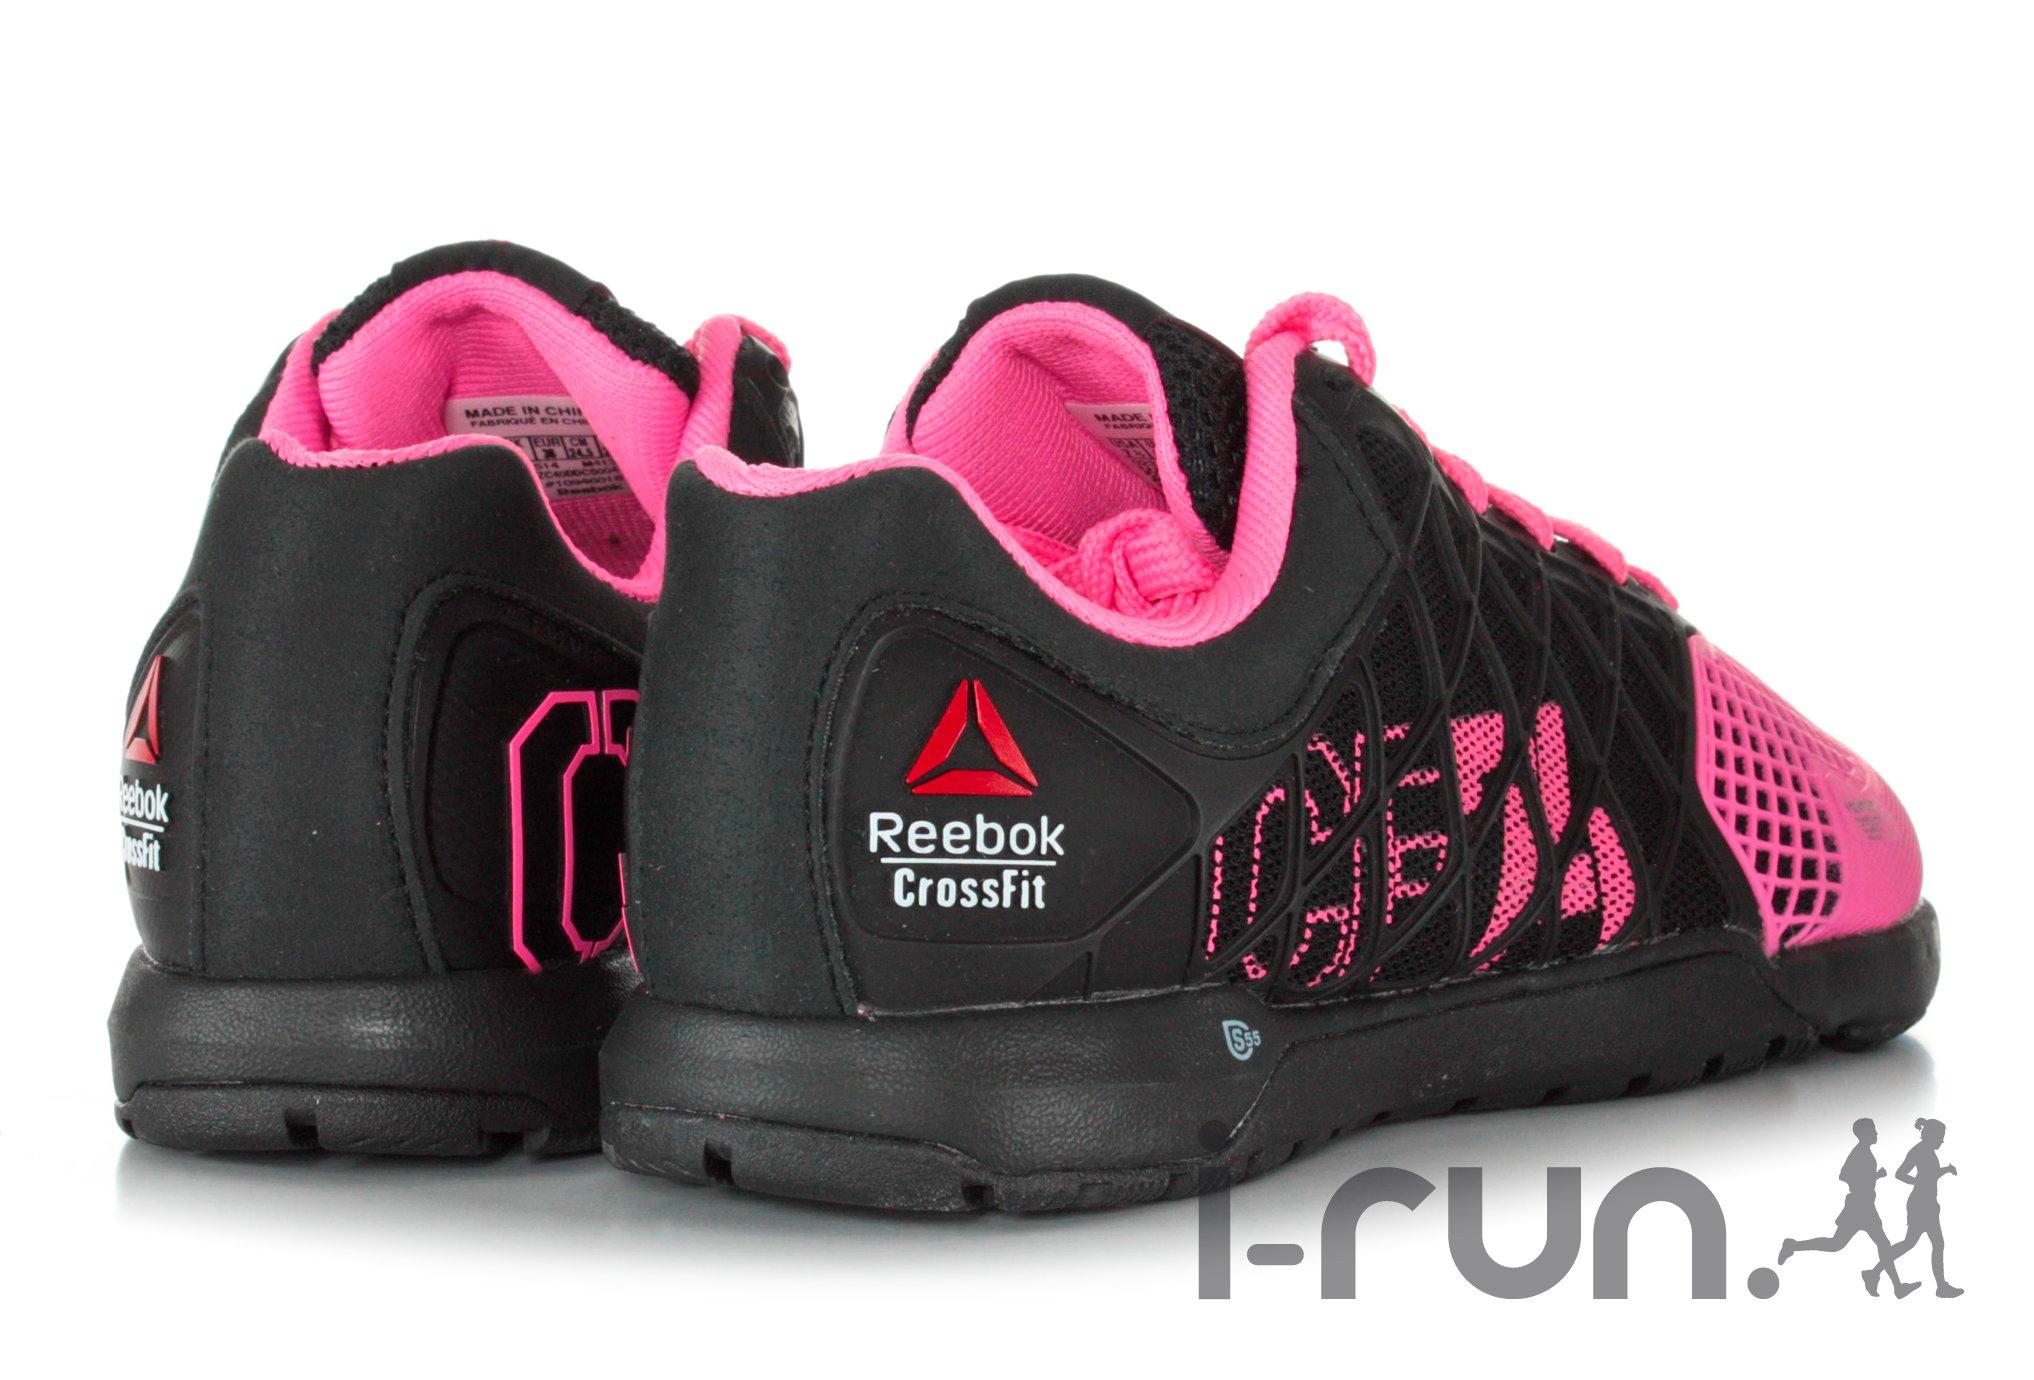 Chaussure Reebok Crossfit Femme